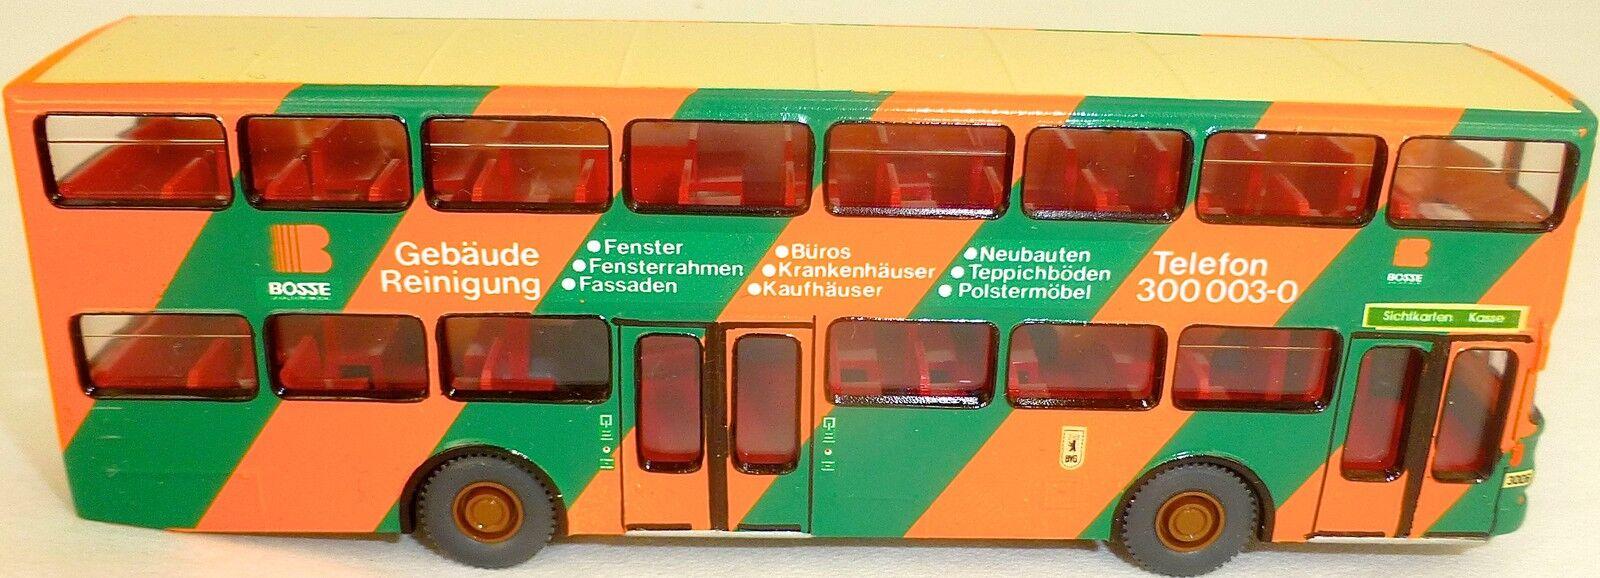 Patrons 19e werbebus on SD 200 gesupert de WIKING BUS h0 1 87 bf37 å